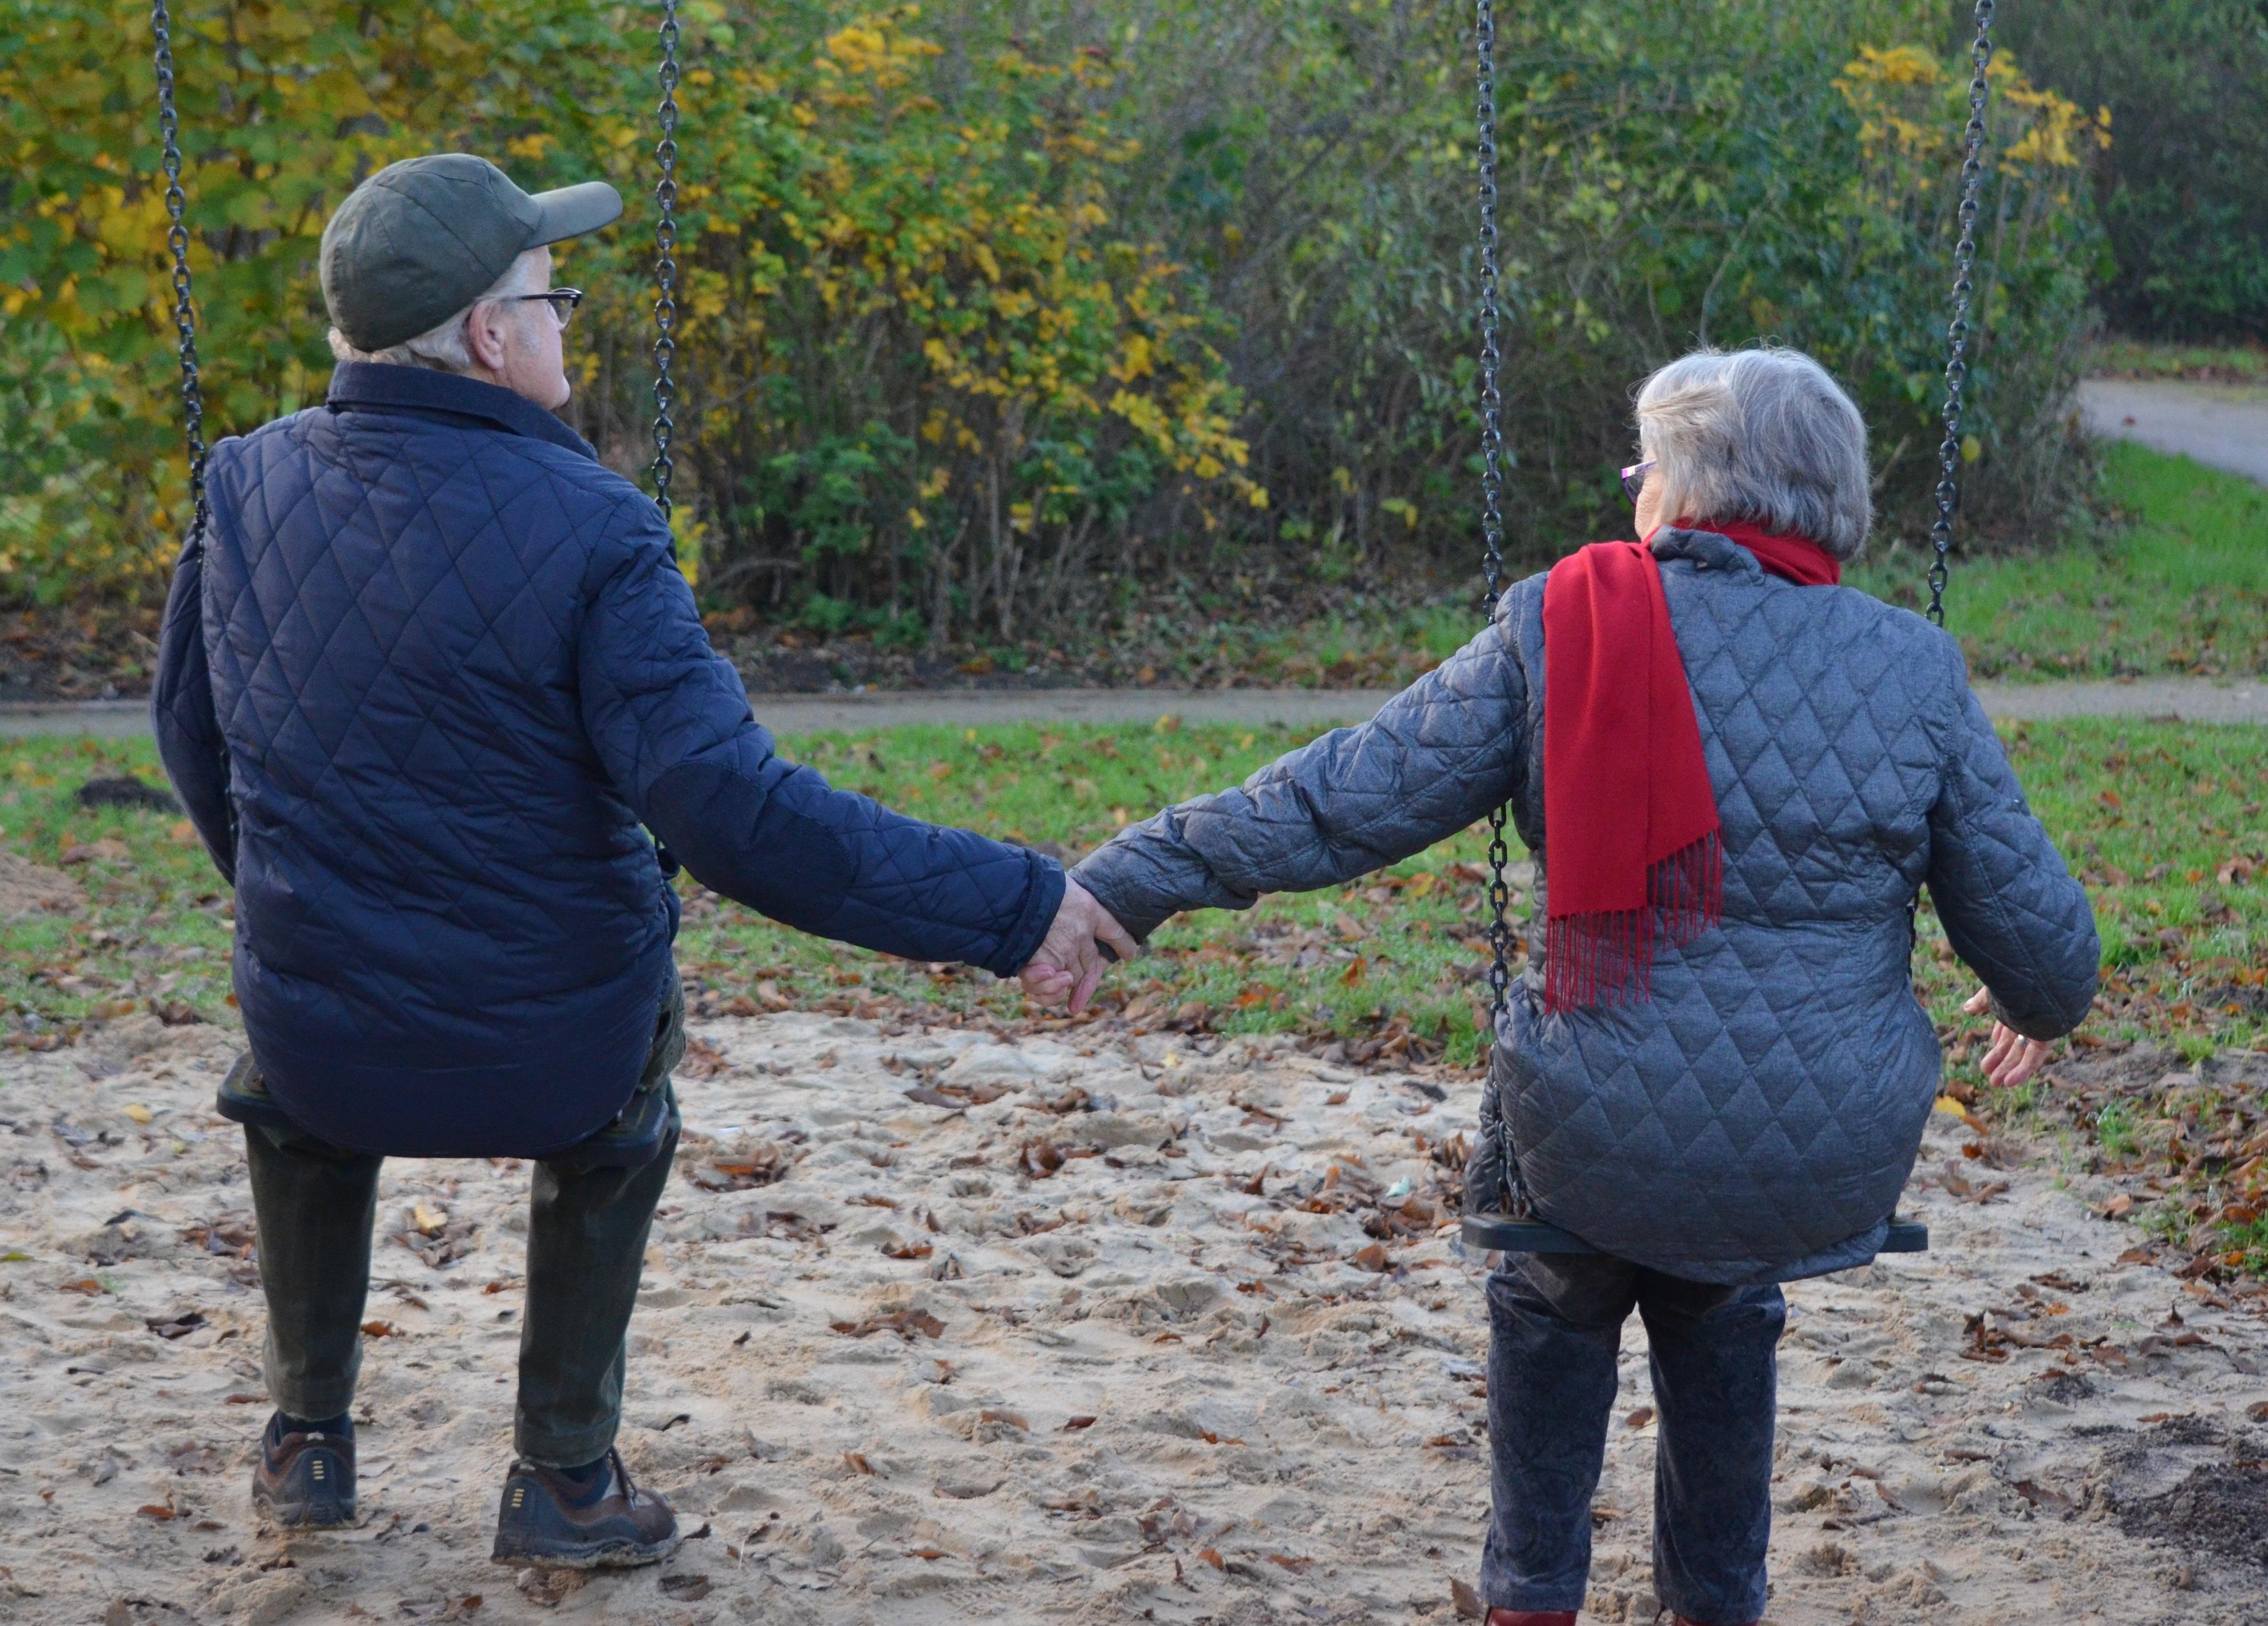 Mediation Matters: Family mediation for the 'silver splitters'